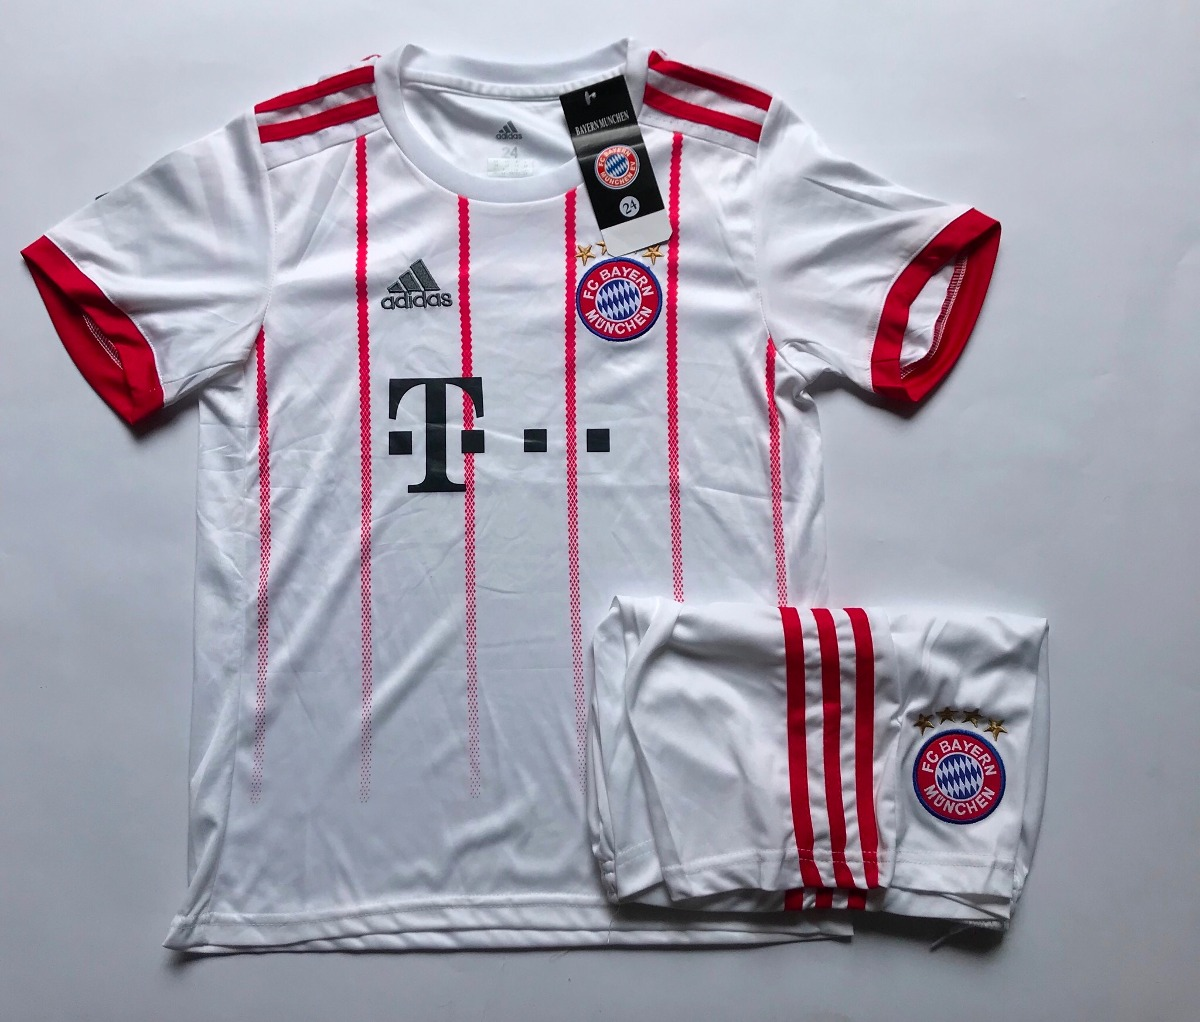 Uniforme Bayern Munich Para Niño -   40.000 en Mercado Libre 376227f71f460